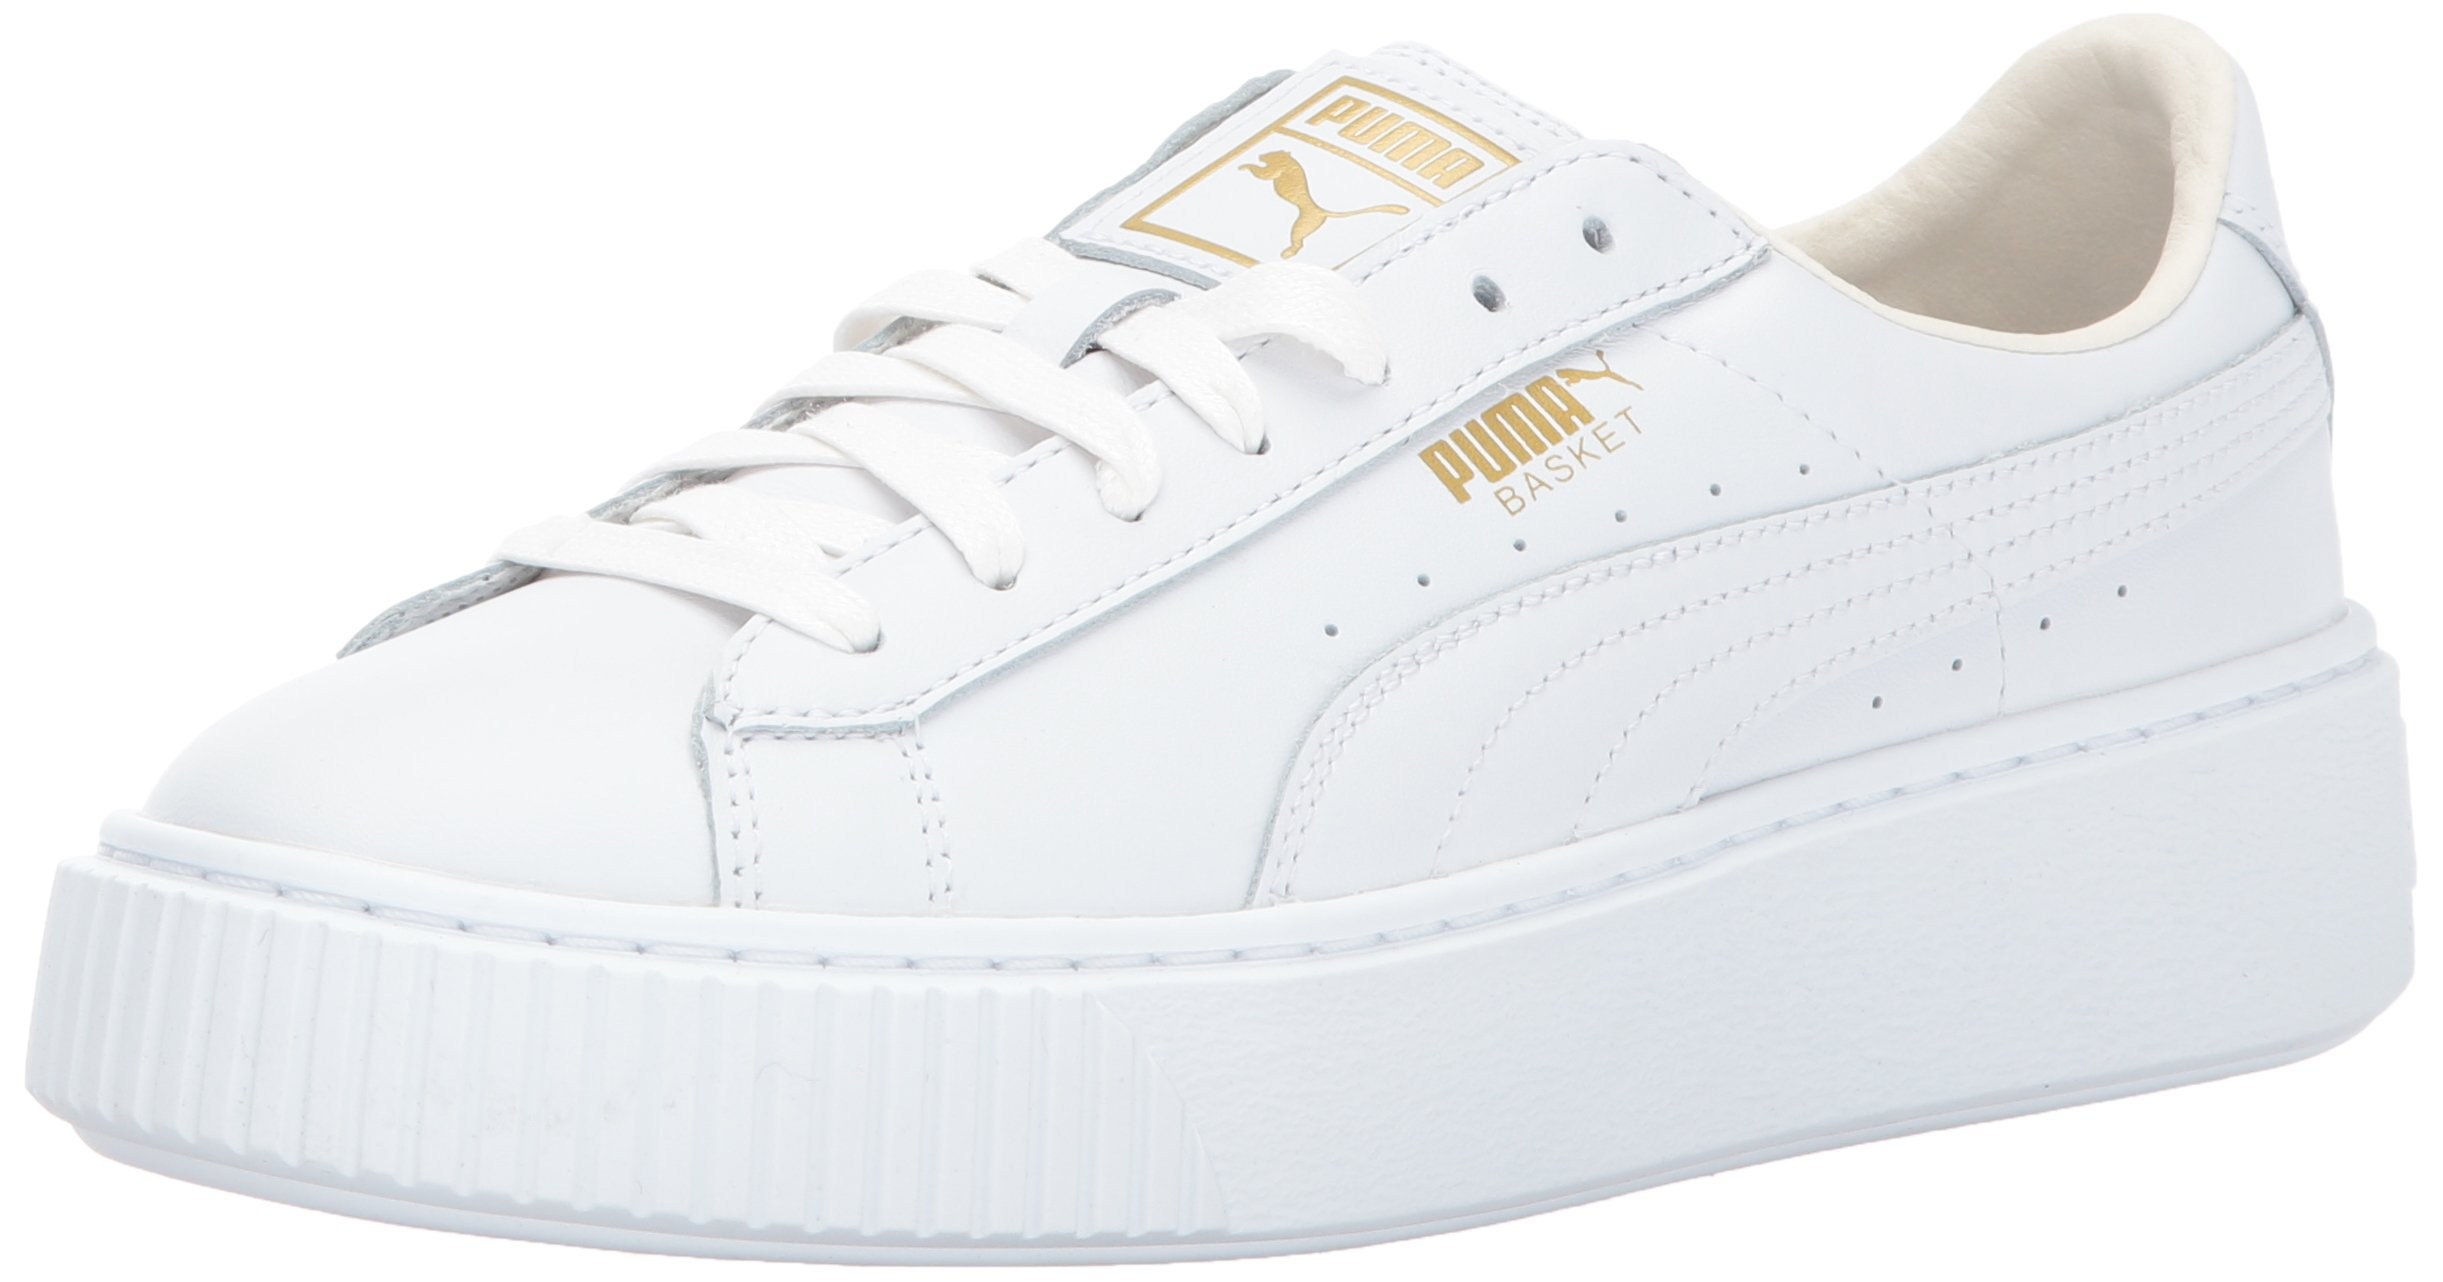 PUMA Women's Basket Platform Core Sneaker, White-Gold,7.5 M US